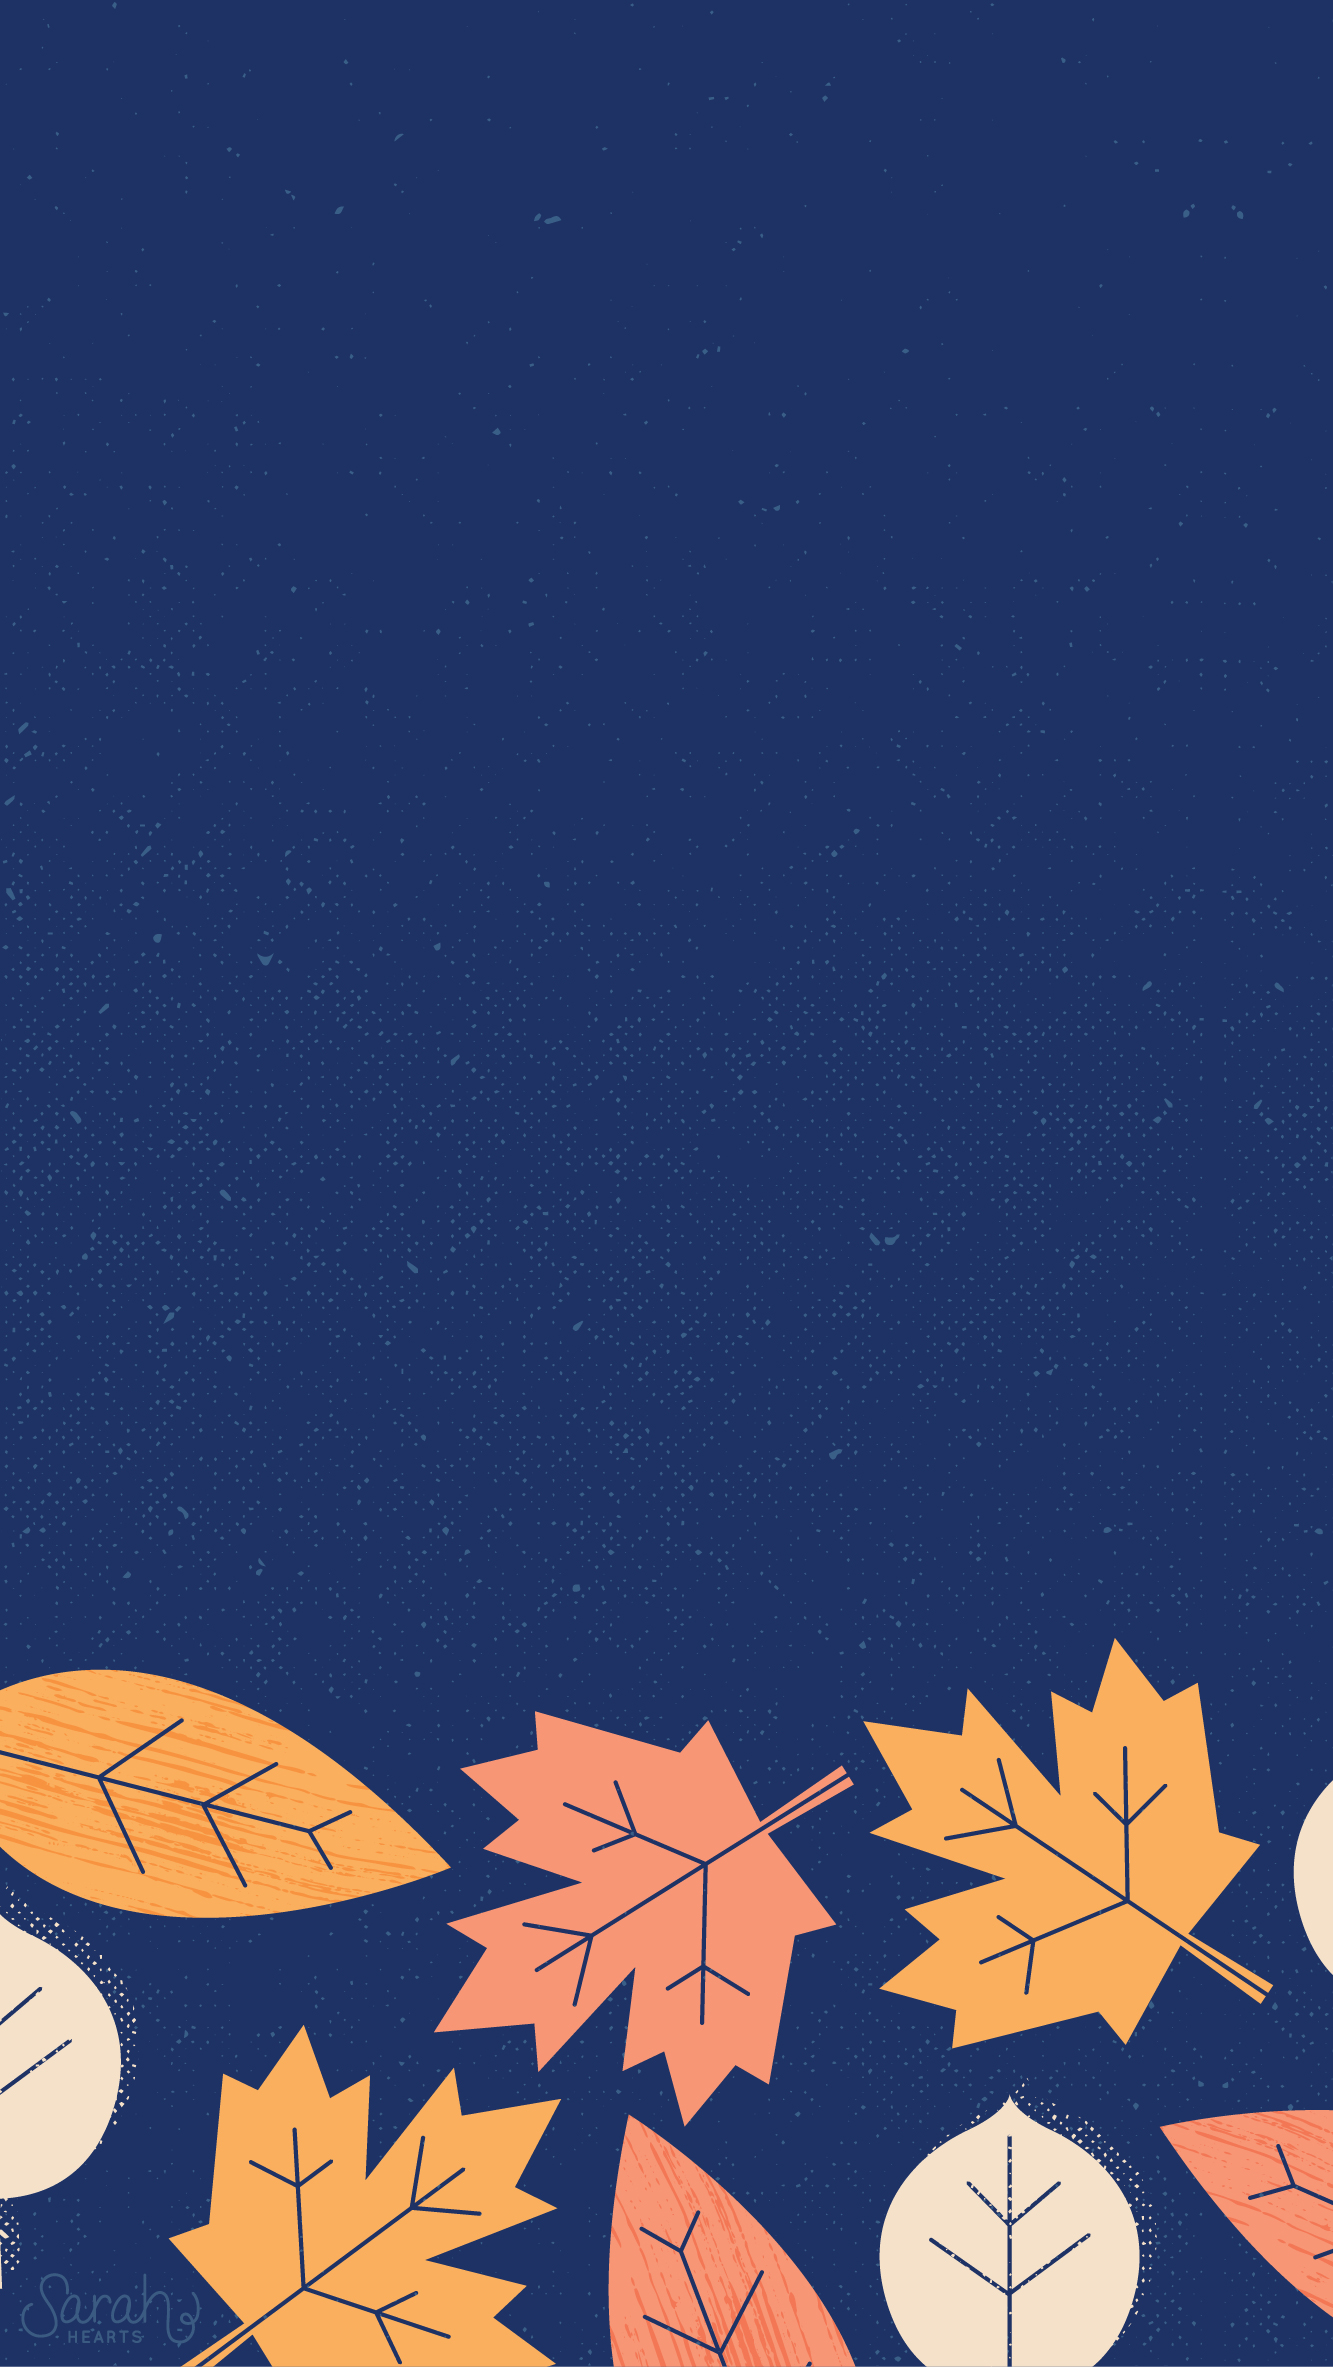 Free Computer Wallpaper Fall Leaves November 2014 Calendar Wallpapers Sarah Hearts